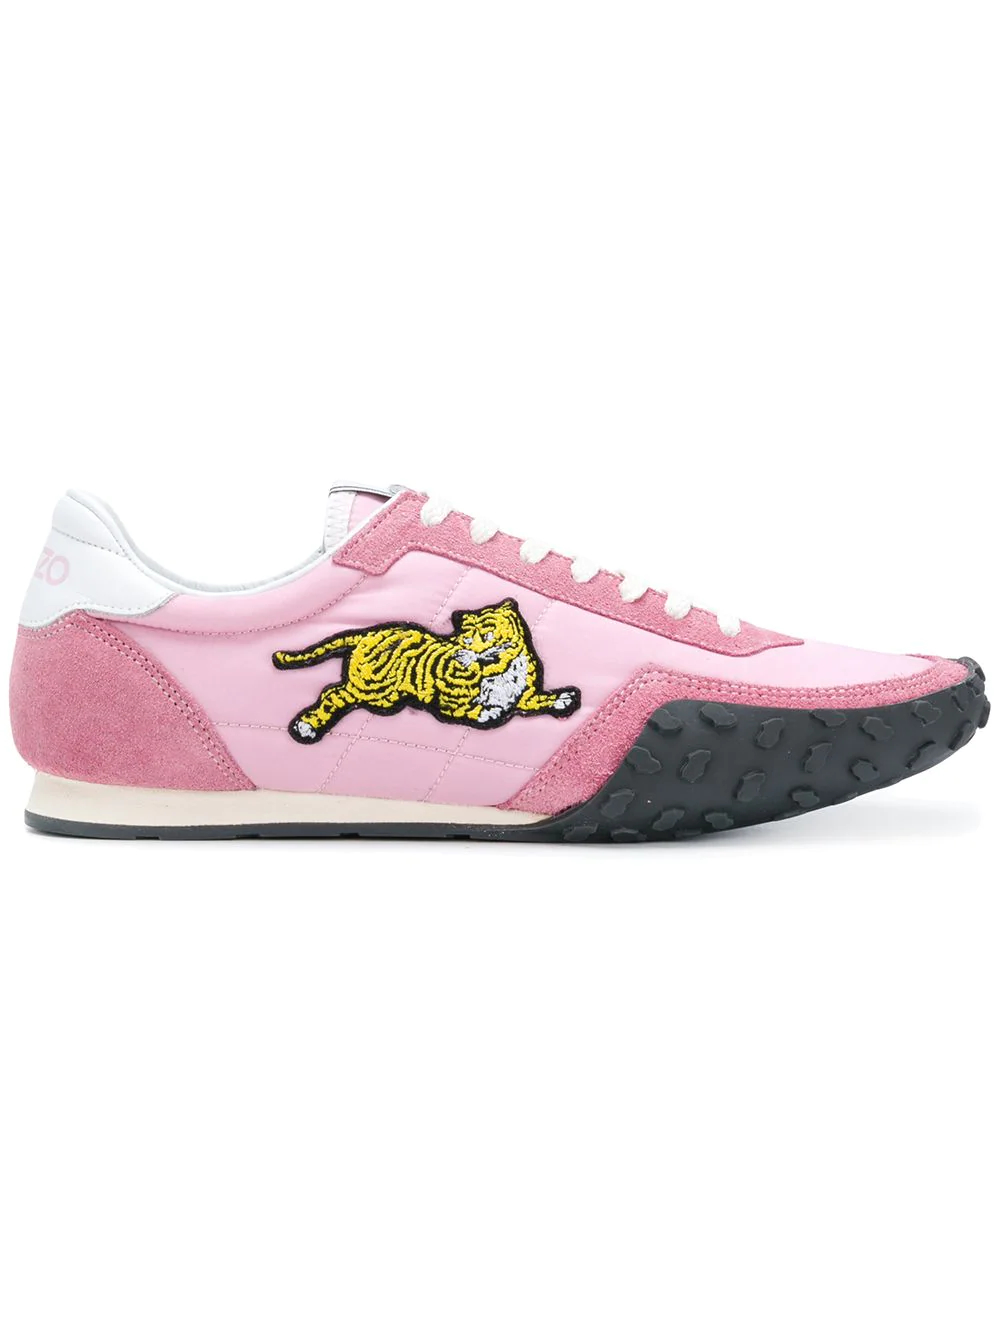 KENZO | кроссовки 'tiger' | Clouty